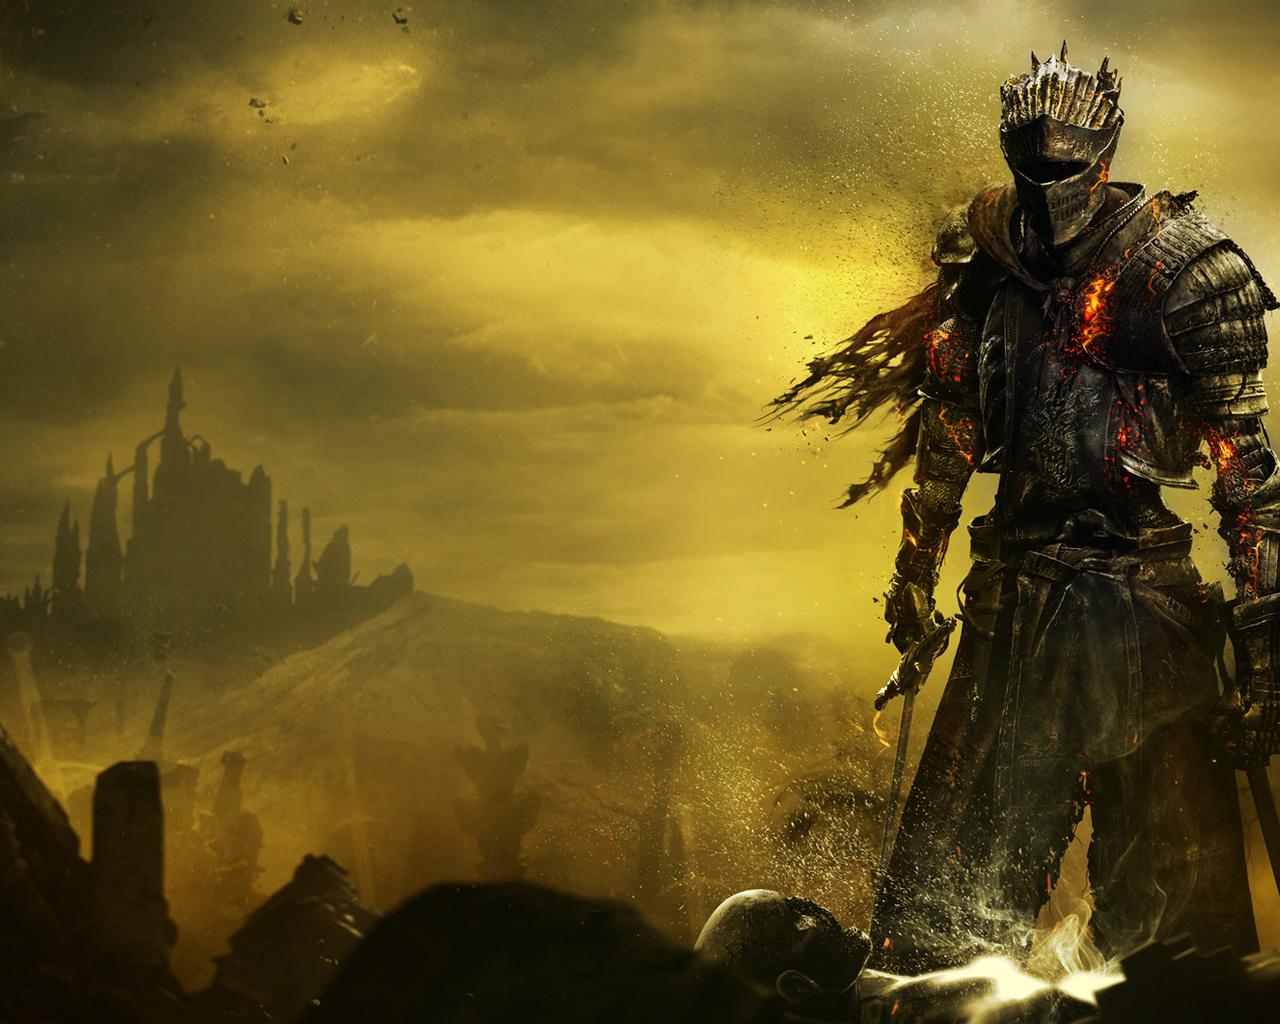 Dark Souls 3 4k Wallpaper: 1280x1024 Dark Souls 3 Cinder 1280x1024 Resolution HD 4k